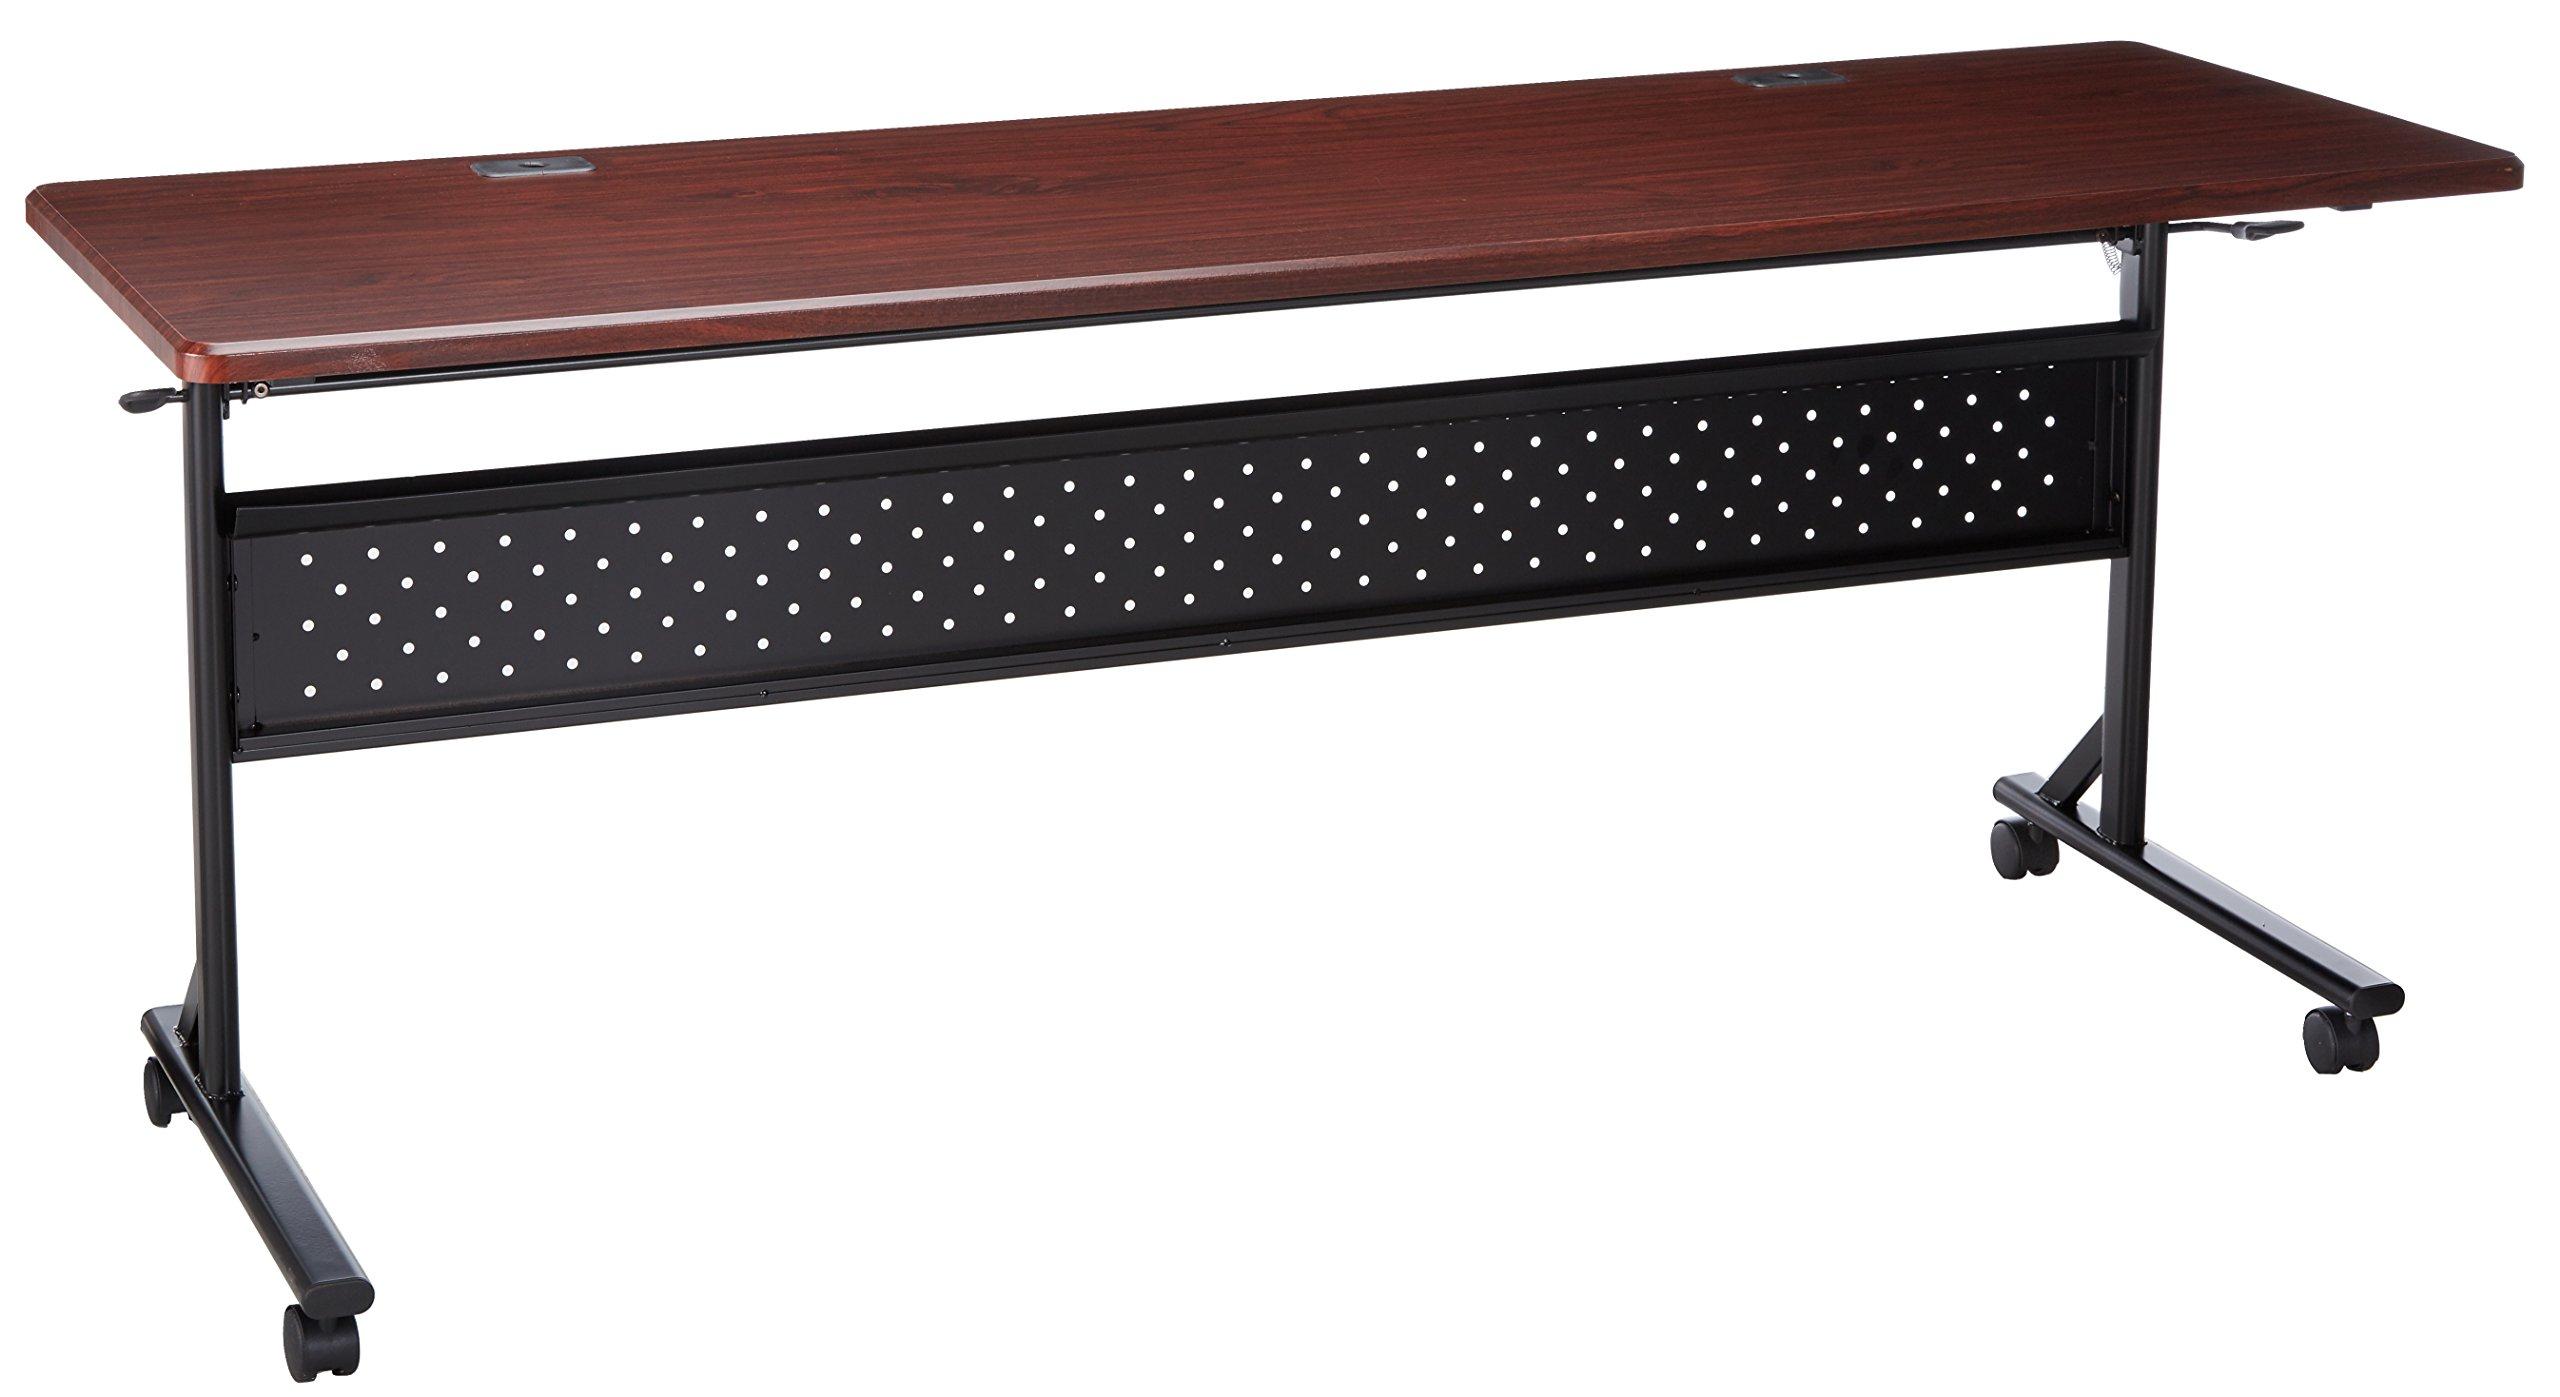 Lorell LLR60670 Flipper Training Tables, 46'' Height X 8'' Width X 8'' Length, Mahogany by Lorell